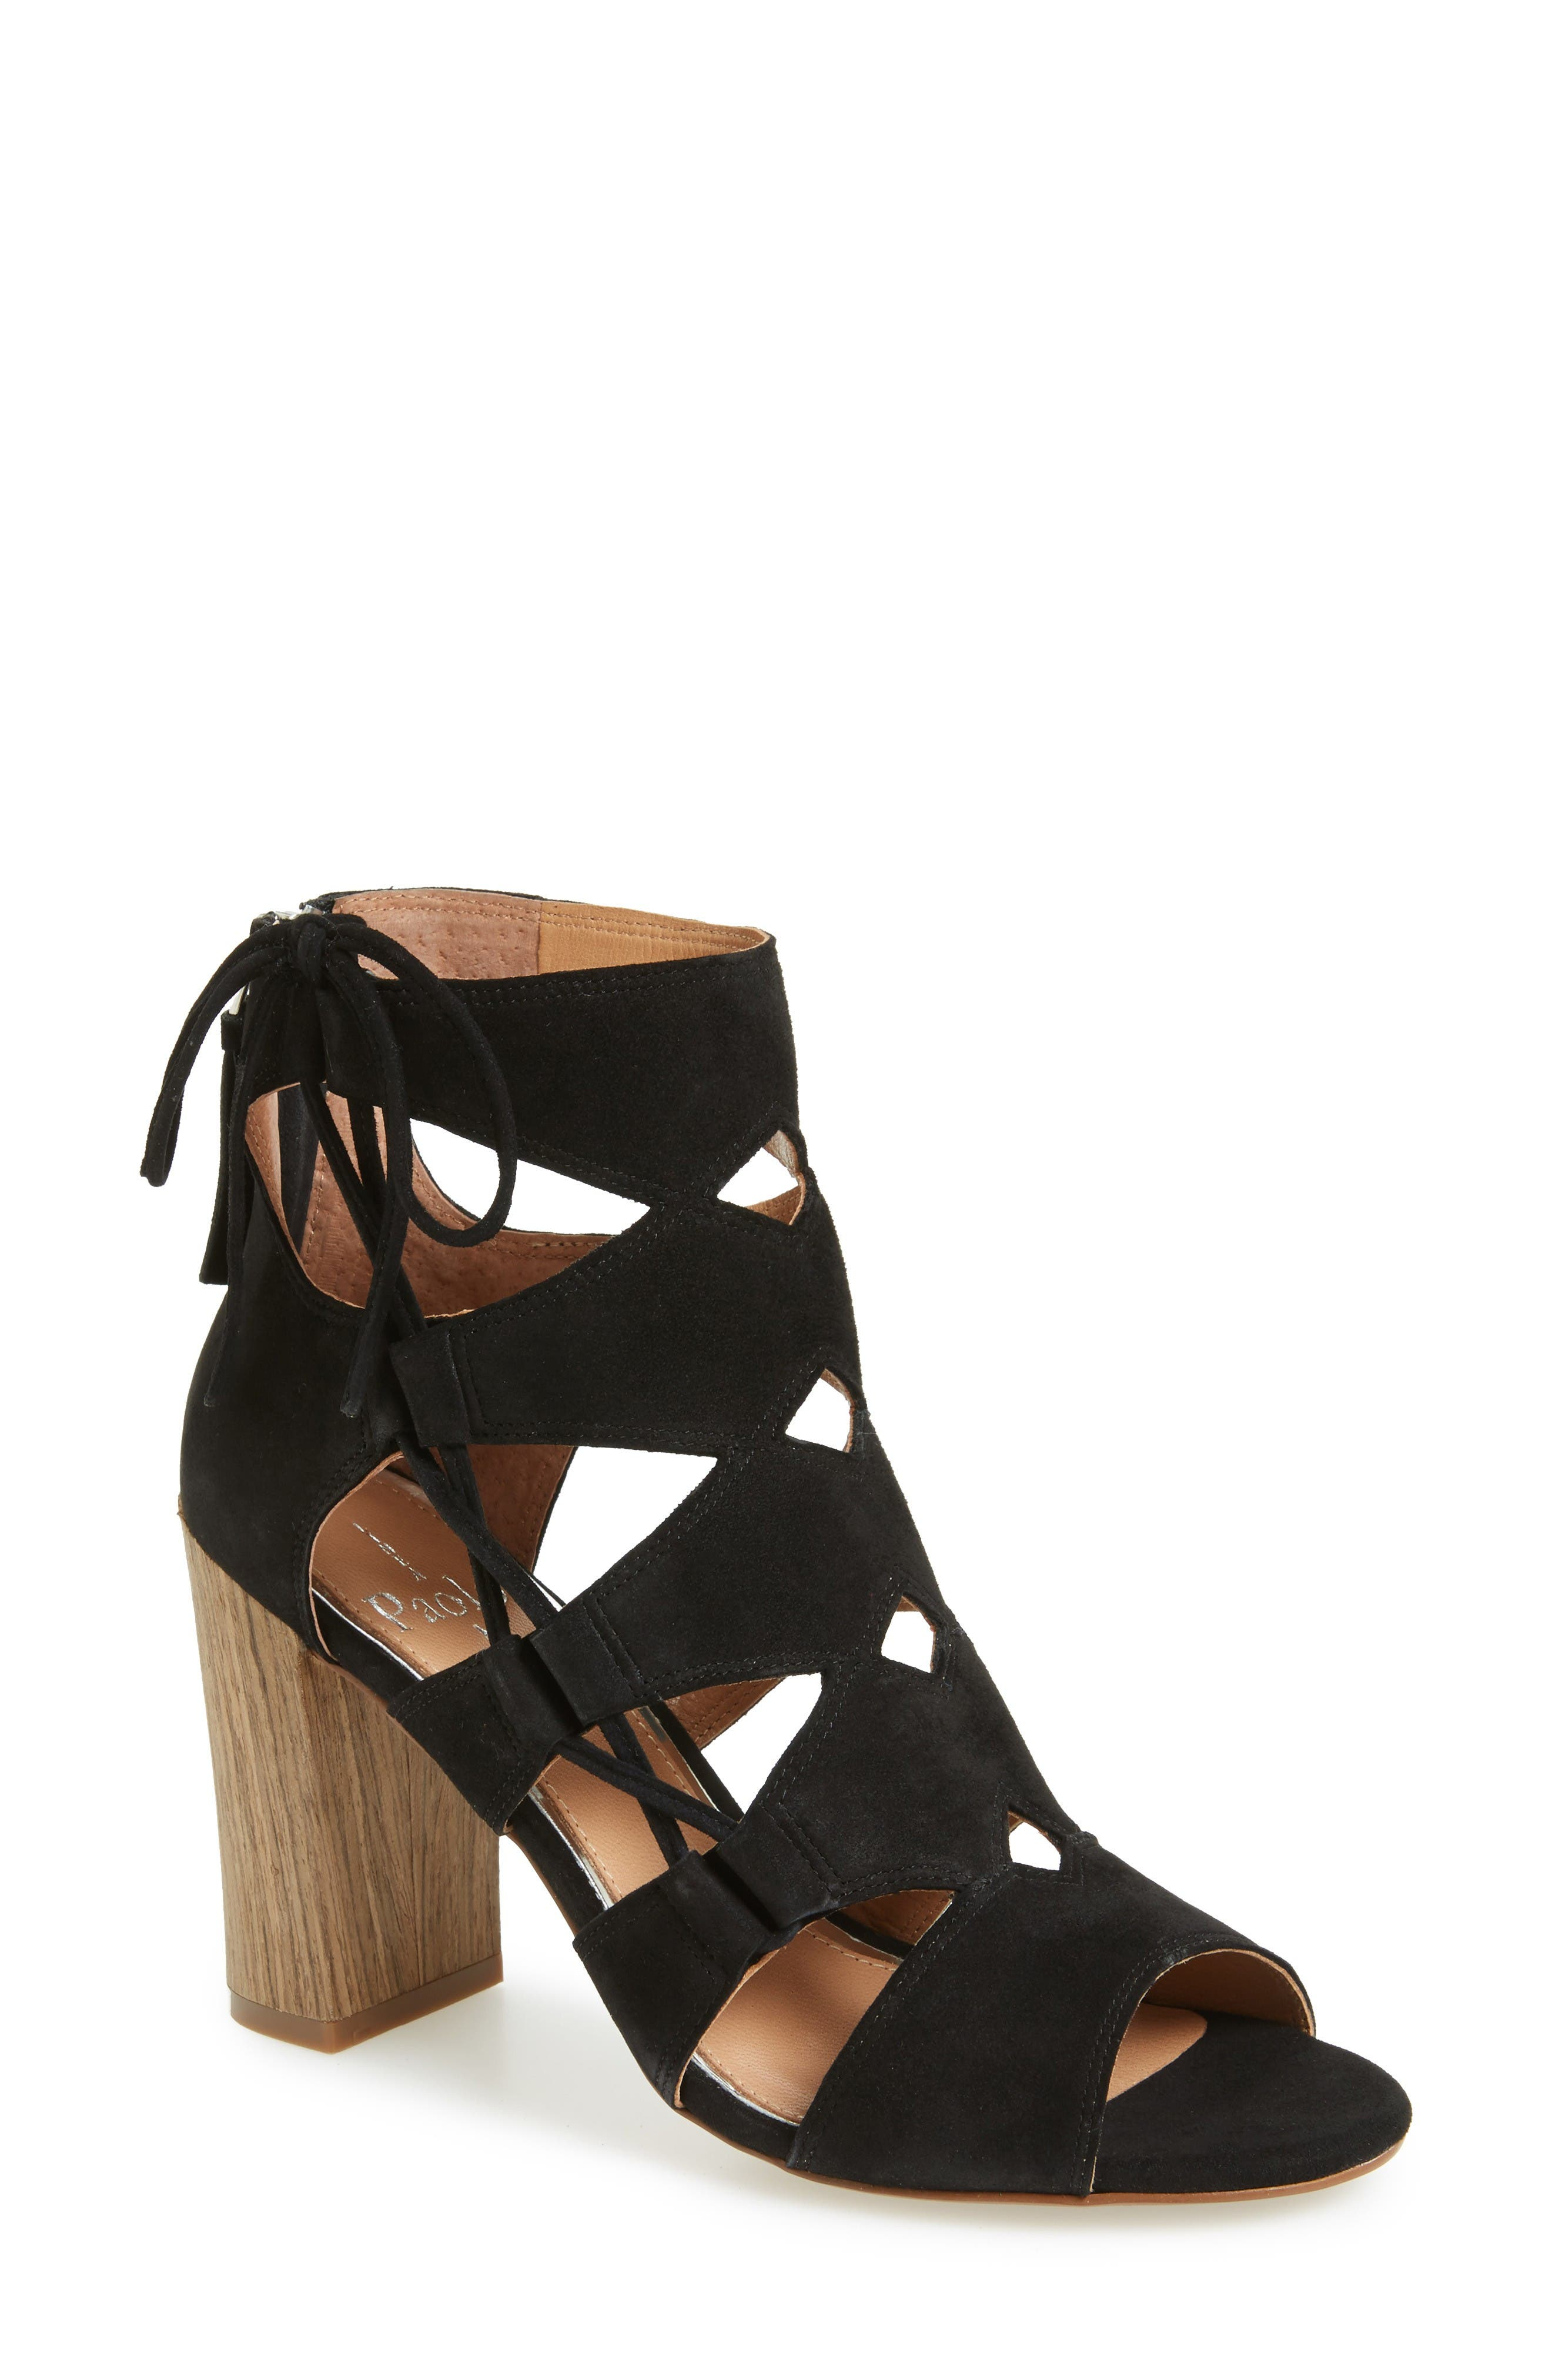 Alternate Image 1 Selected - Linea Paolo Hawley Cutout Sandal (Women)